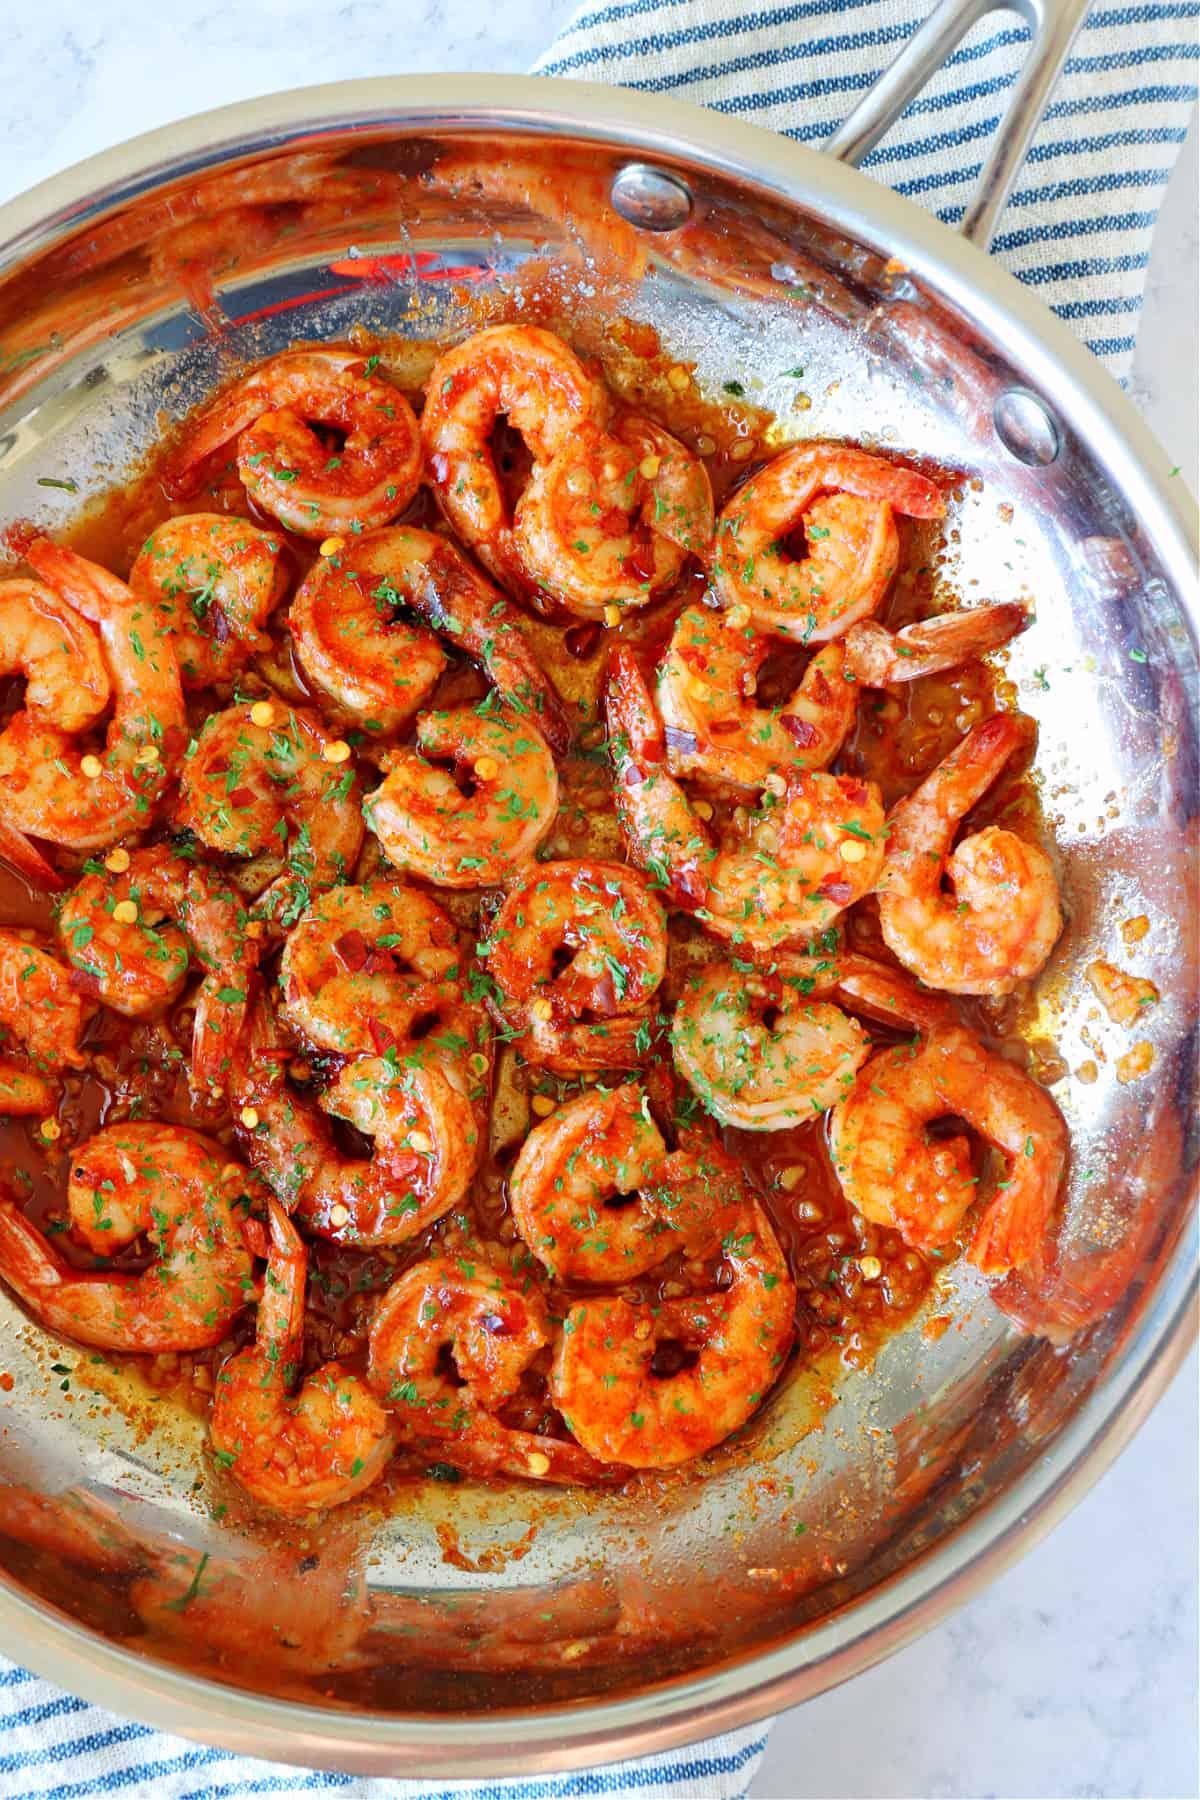 cajun shrimp B Cajun Shrimp